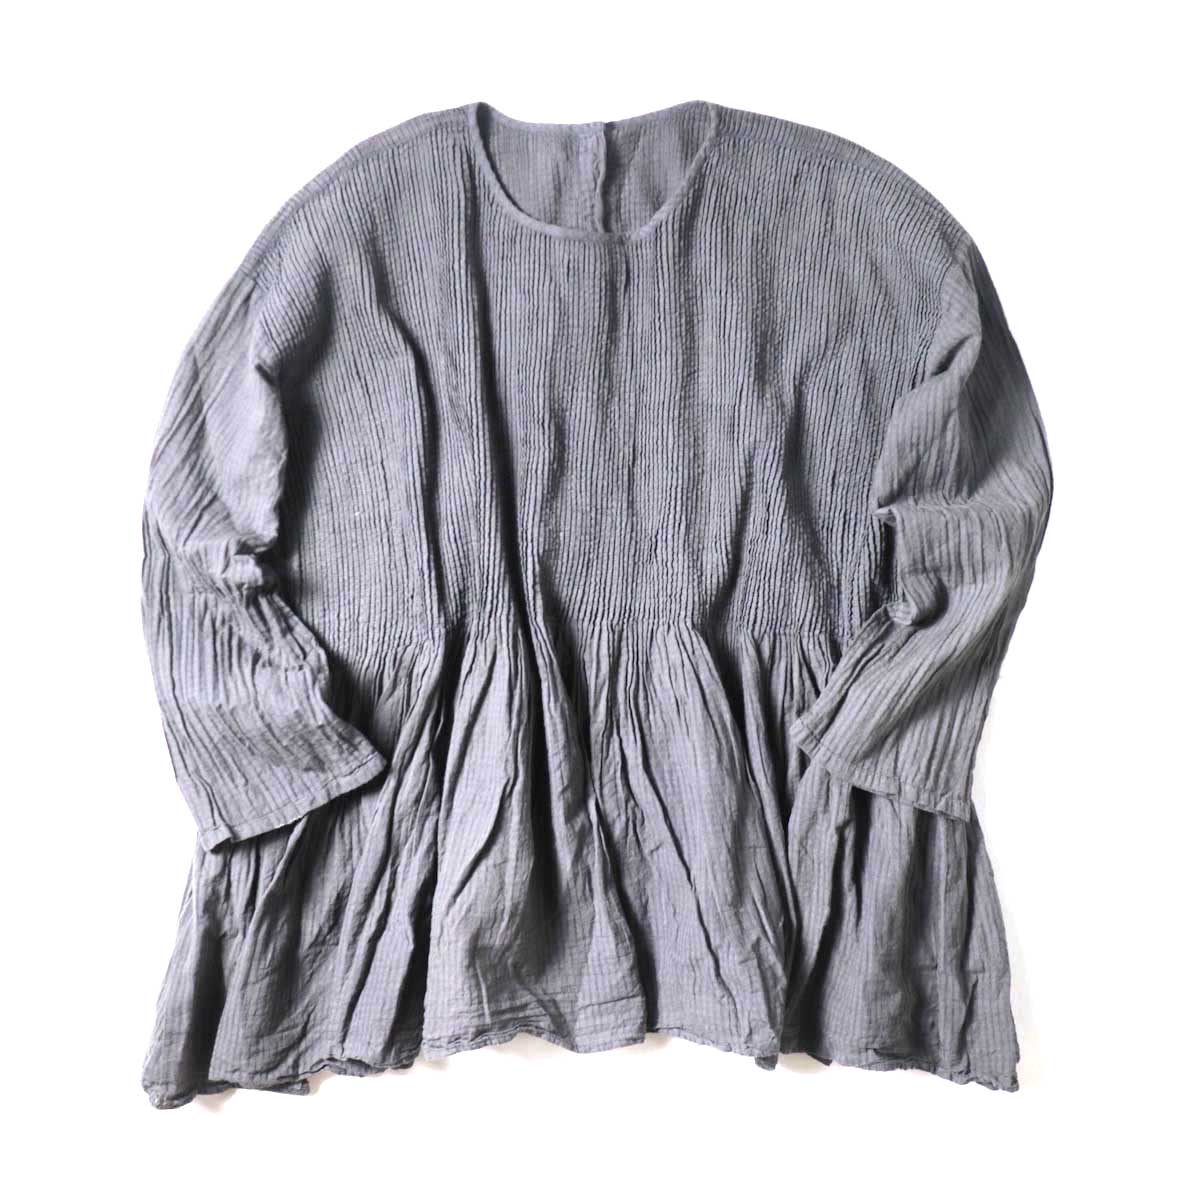 maison de soil / BANDED SHIRT DRESS WITH MINI PINTUCK (Smoke)